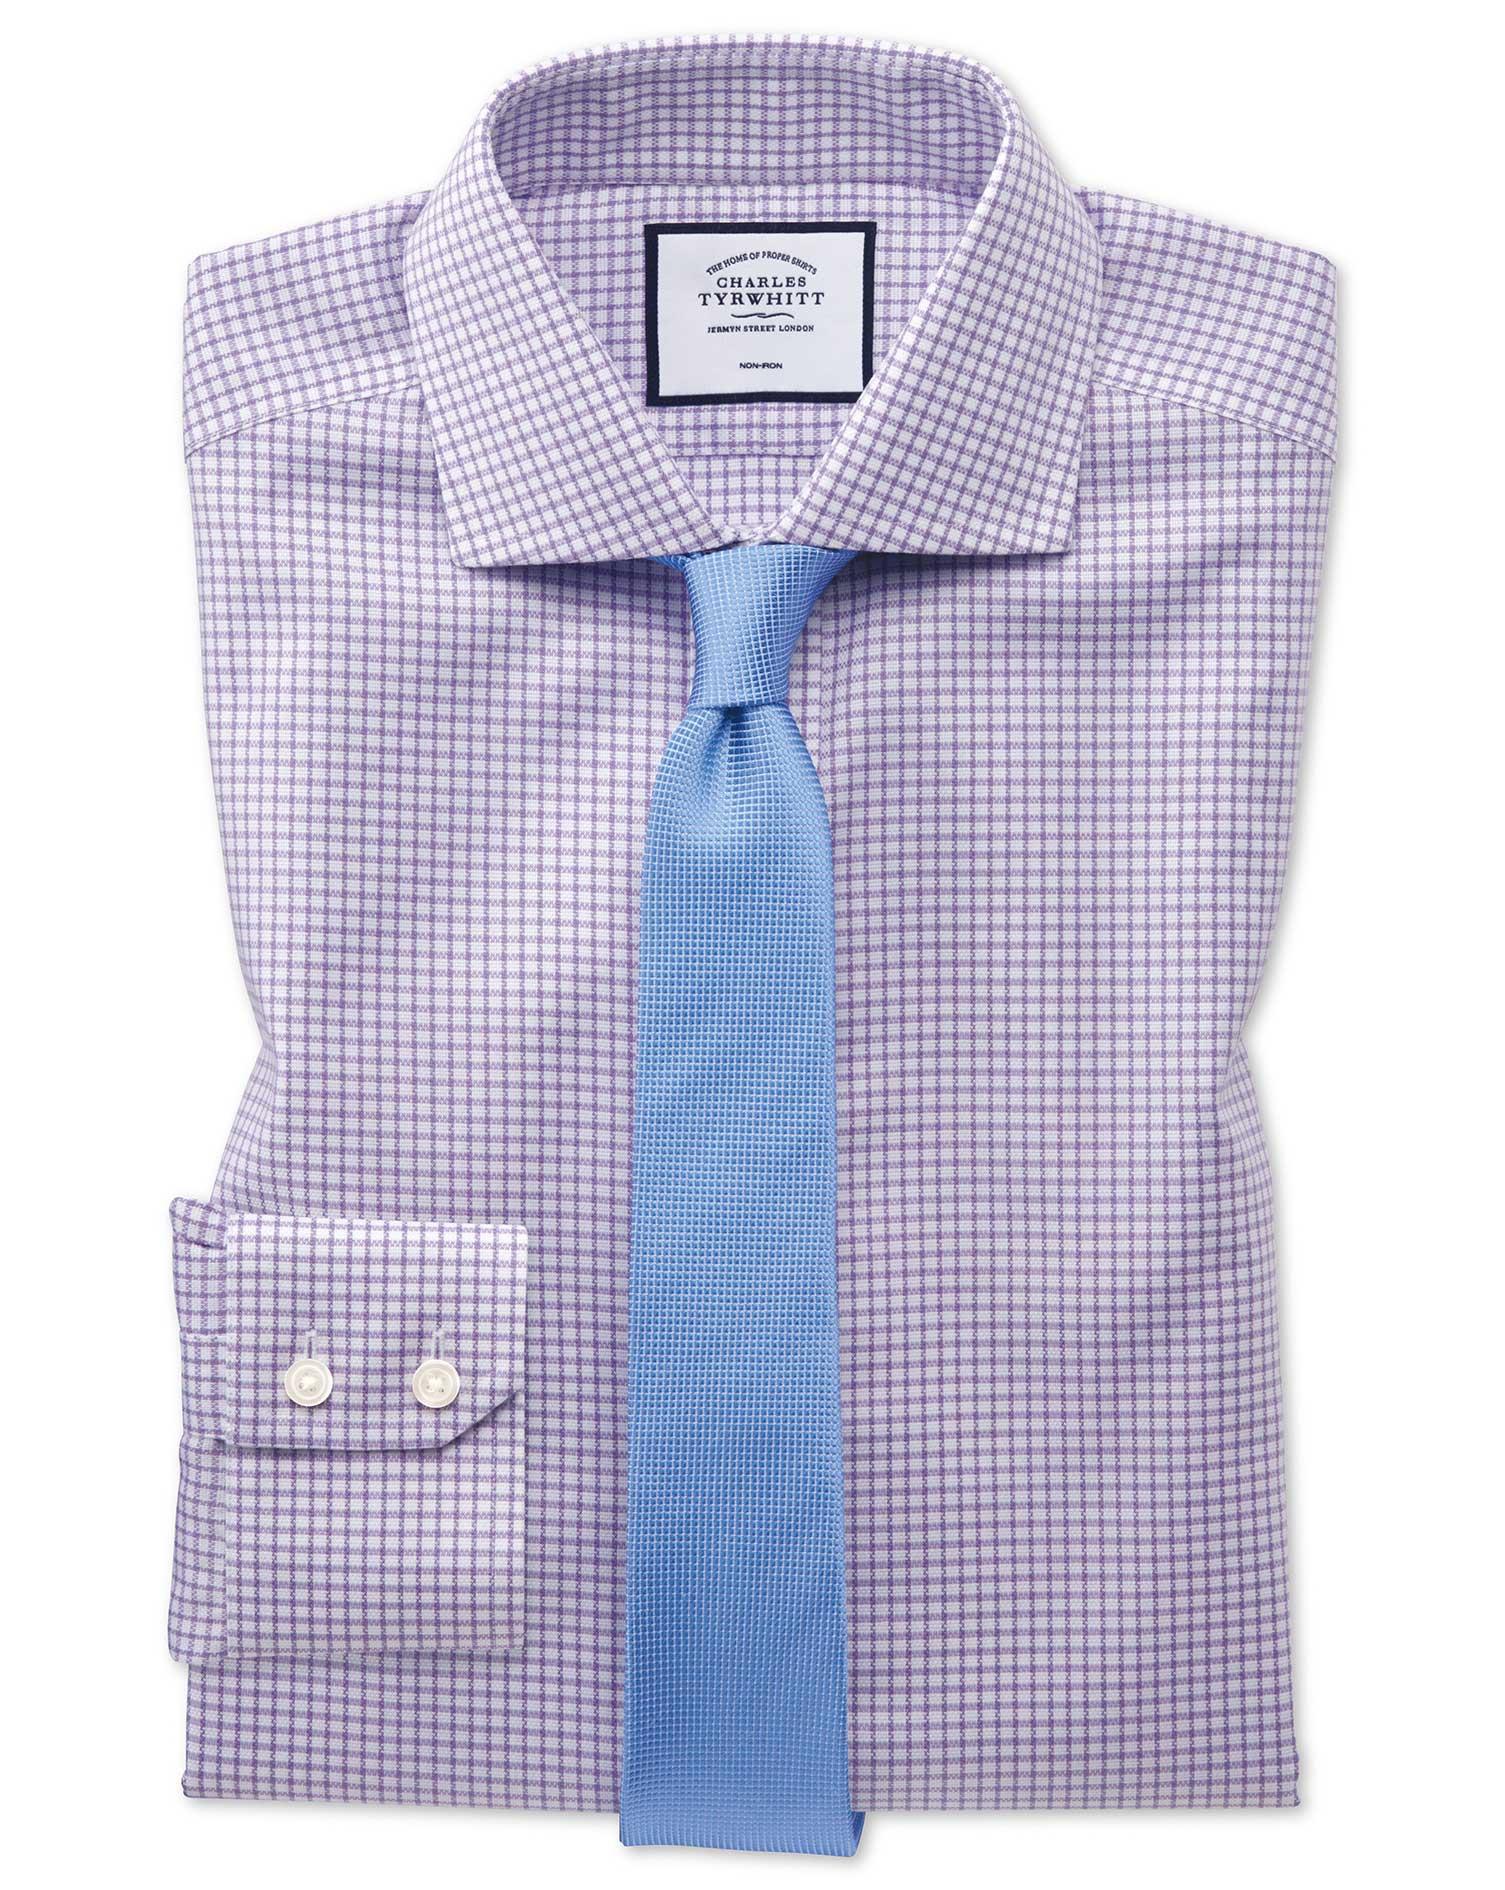 Extra Slim Fit Non-Iron Cutaway Collar Lilac Grid Check Oxford Stretch Cotton Formal Shirt Single Cu